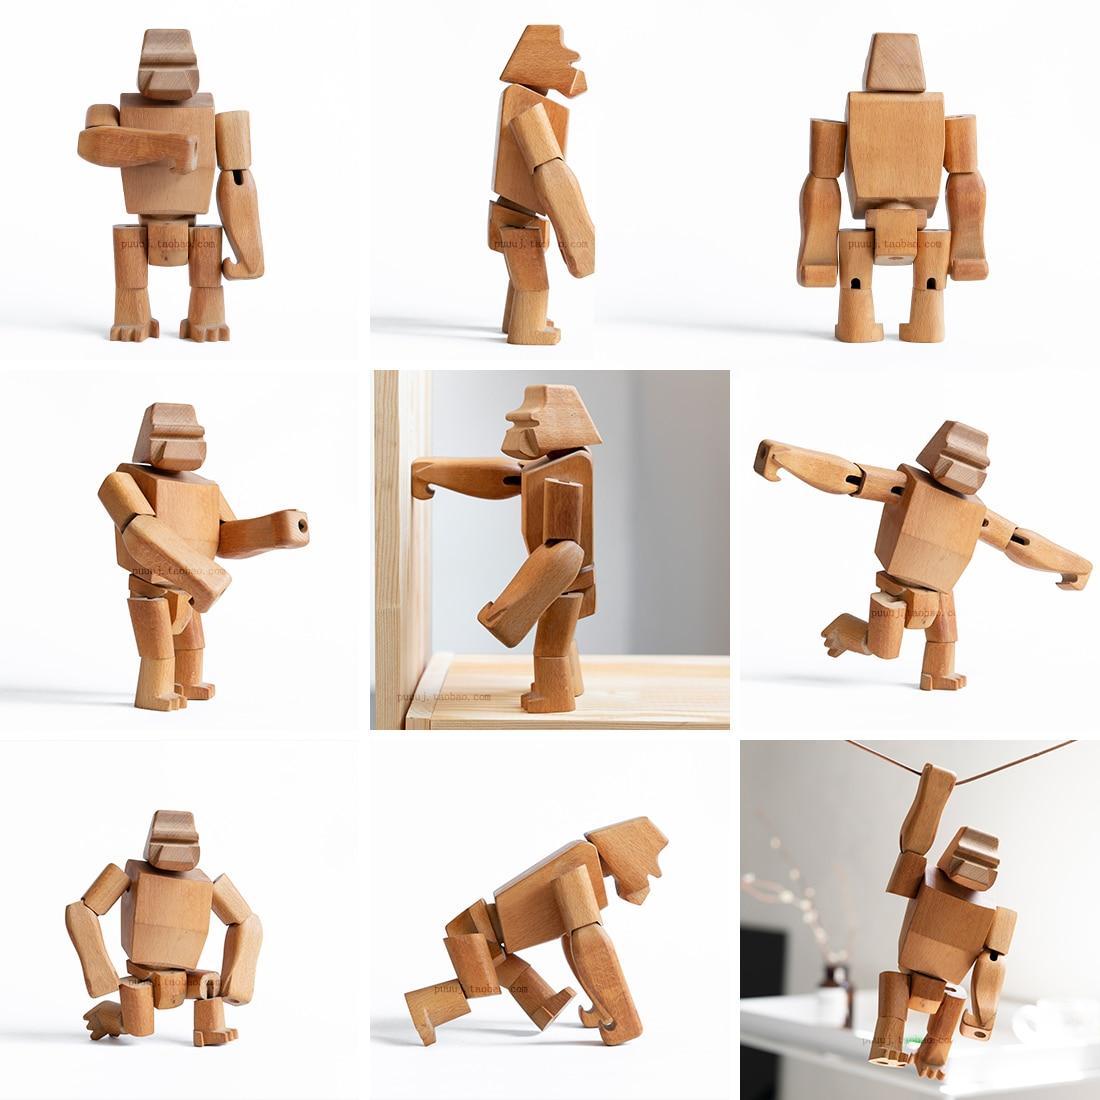 Handmade Wooden Figurine Monkey Orangutan Kids Room Bedroom Living Room Home Decoration Accessories Ornaments Holiday Gift Toys